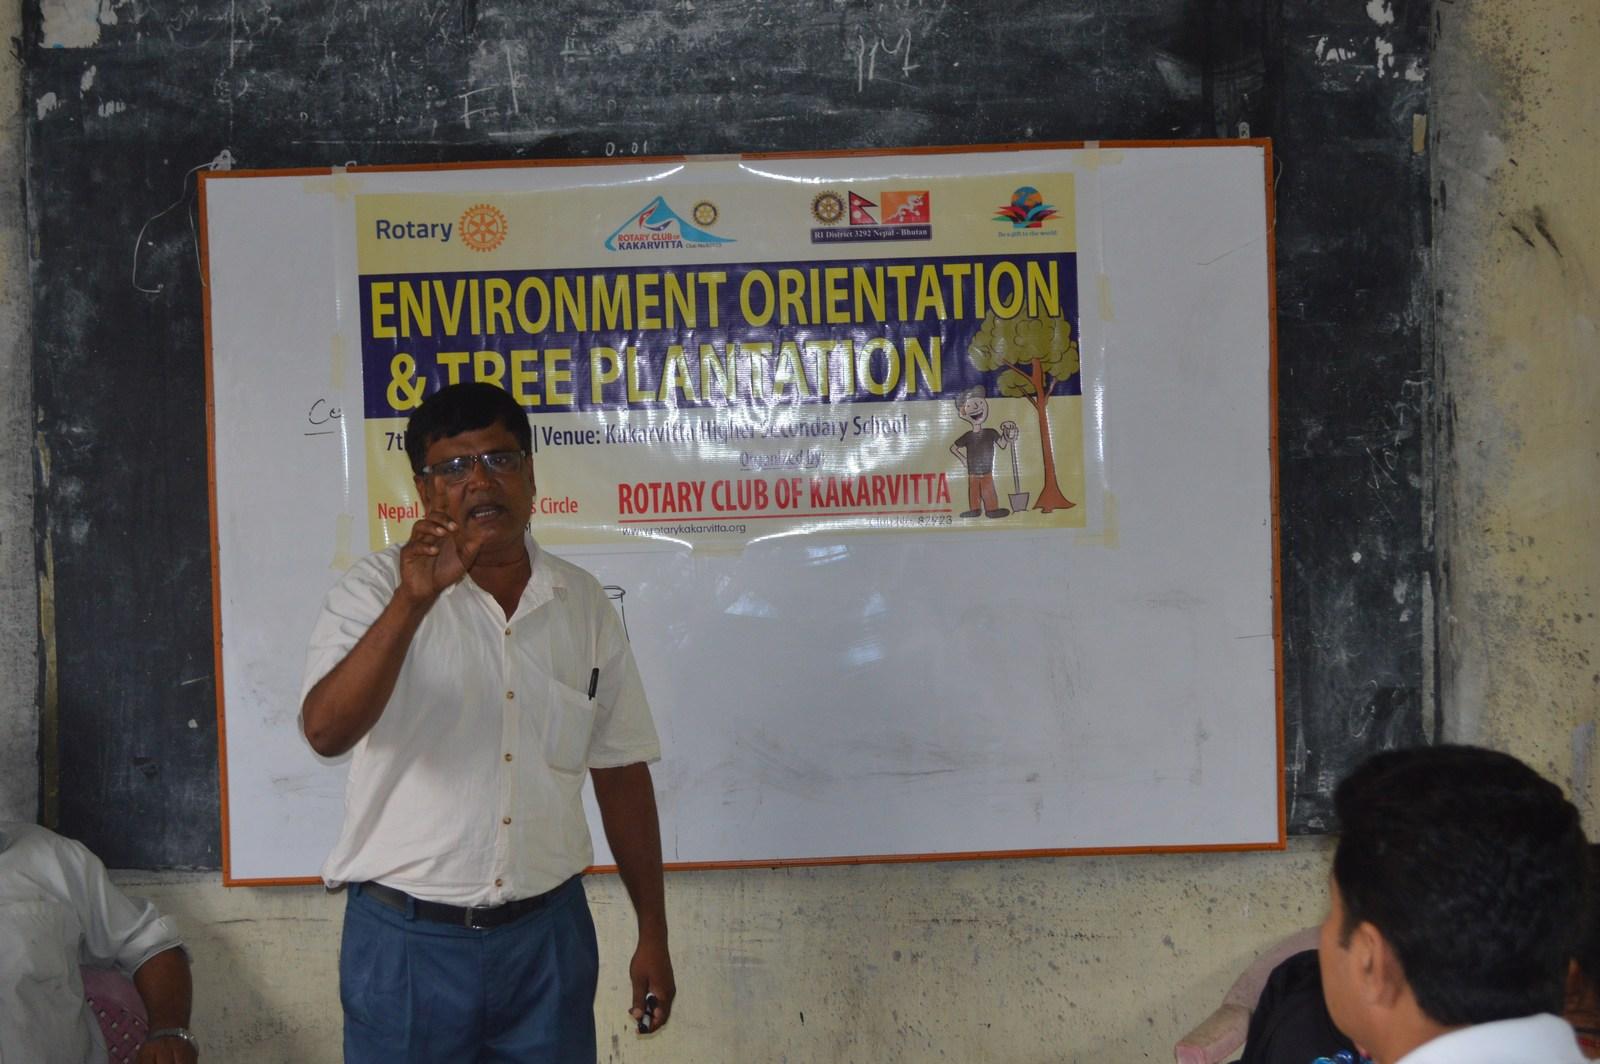 Enviroment Orientation Tree Plantation Rotary Club Of Kakarvitta 7